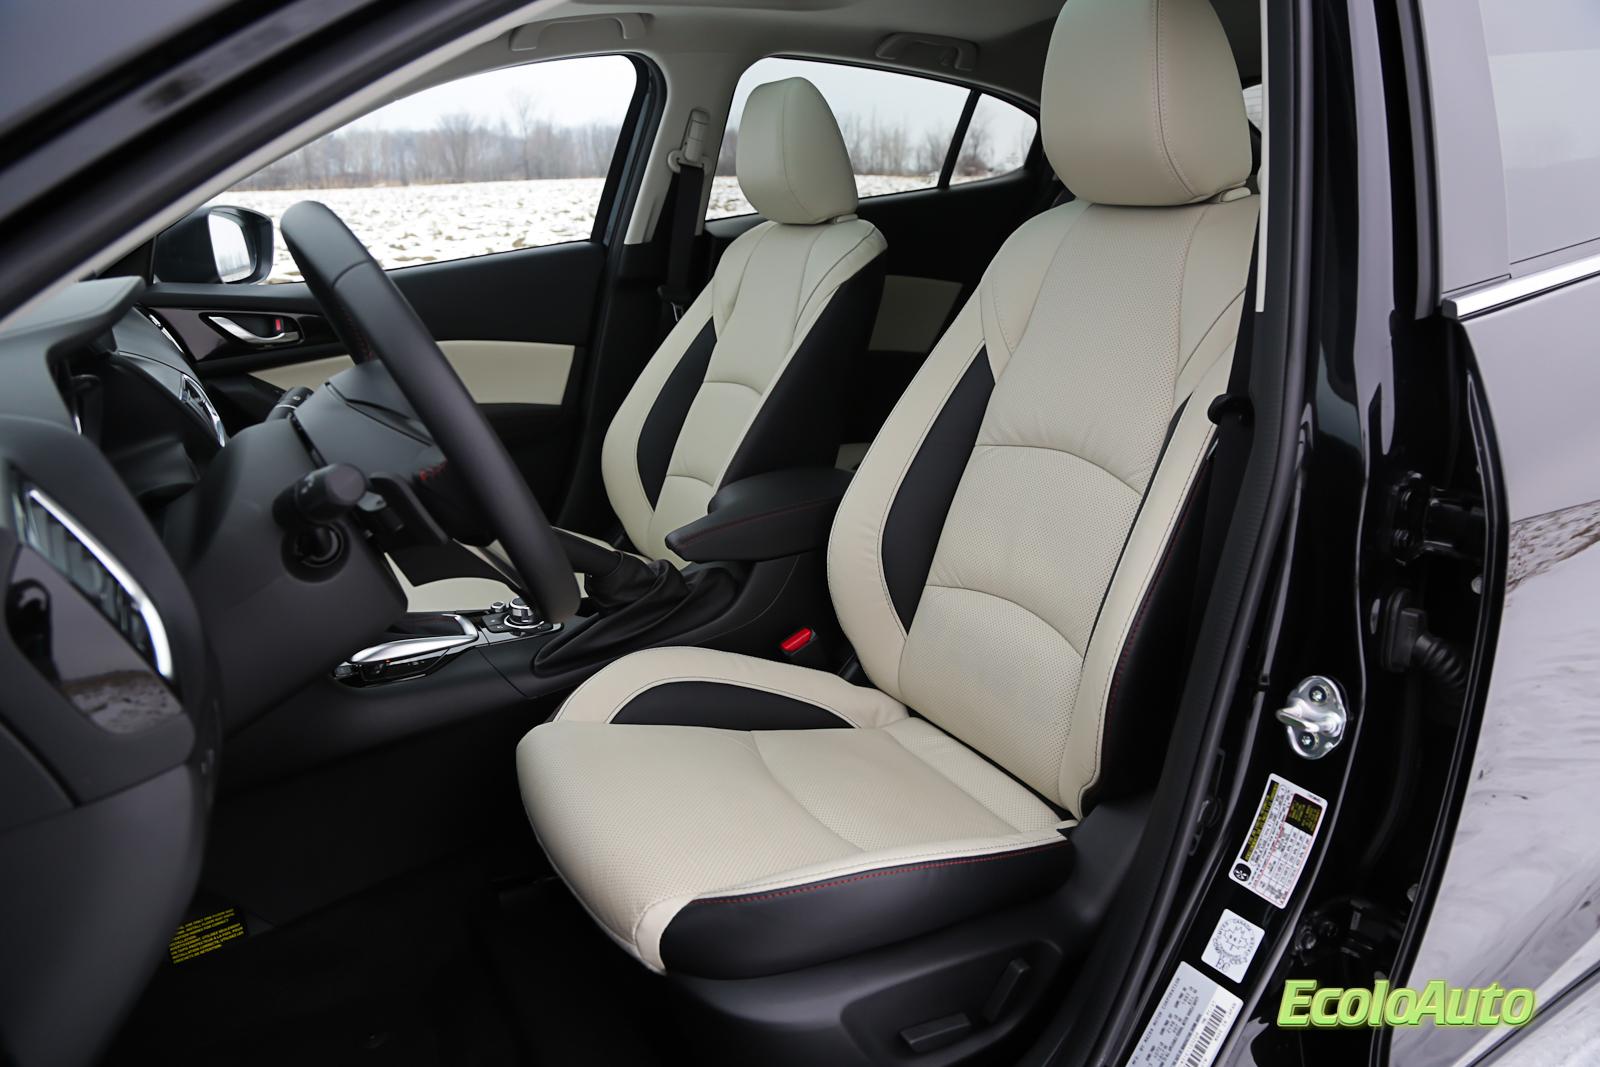 Mazda-3-2014-essai-routier-35